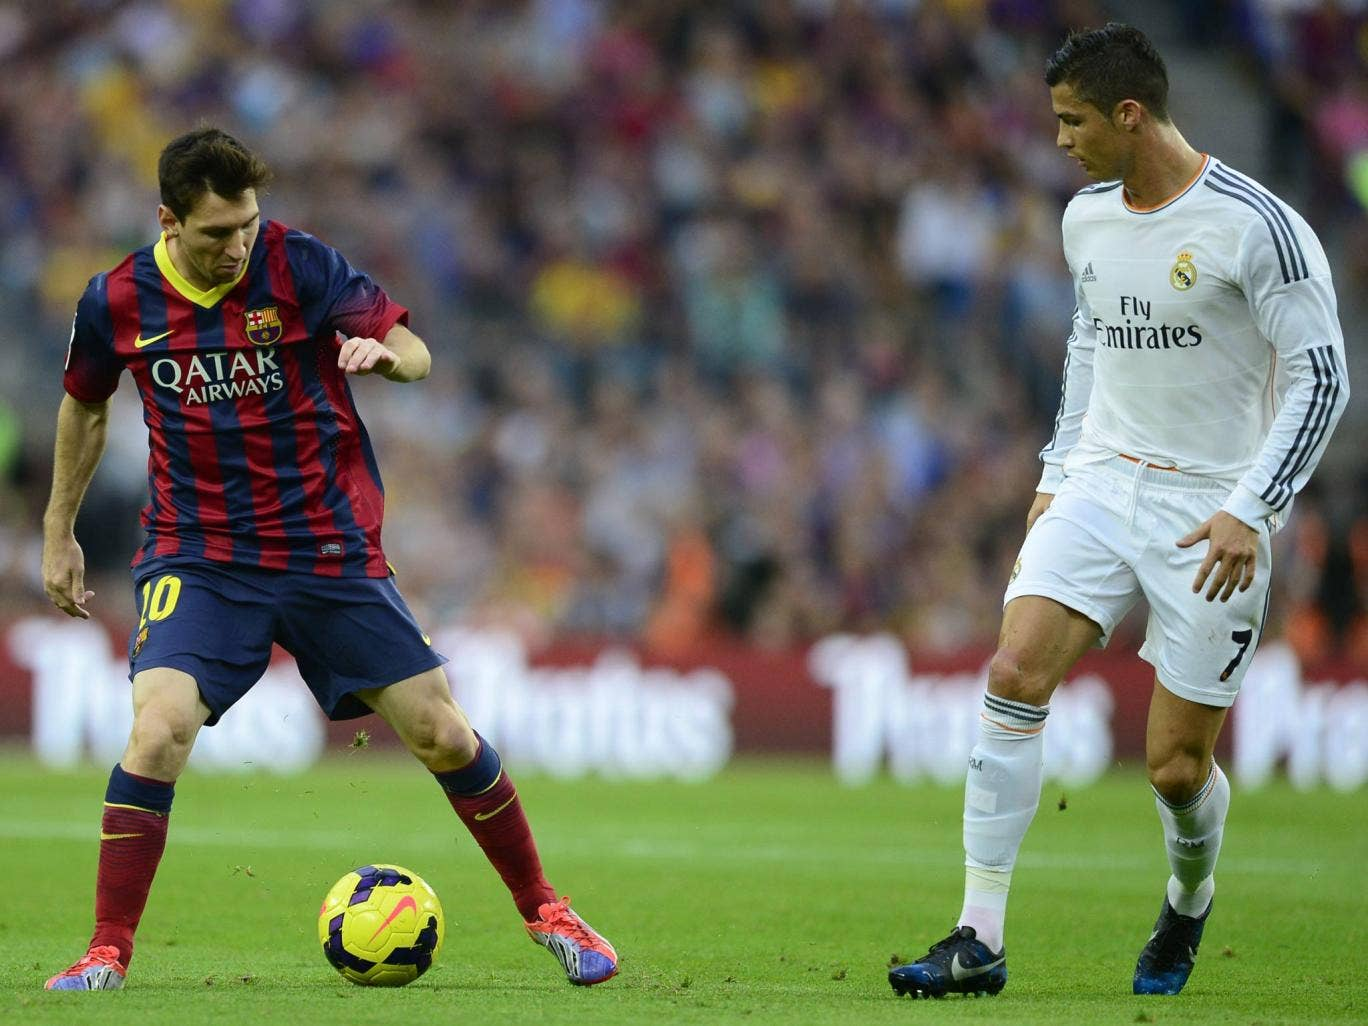 Lionel Messi and Cristiano Ronaldo pictured in October's El Clasico